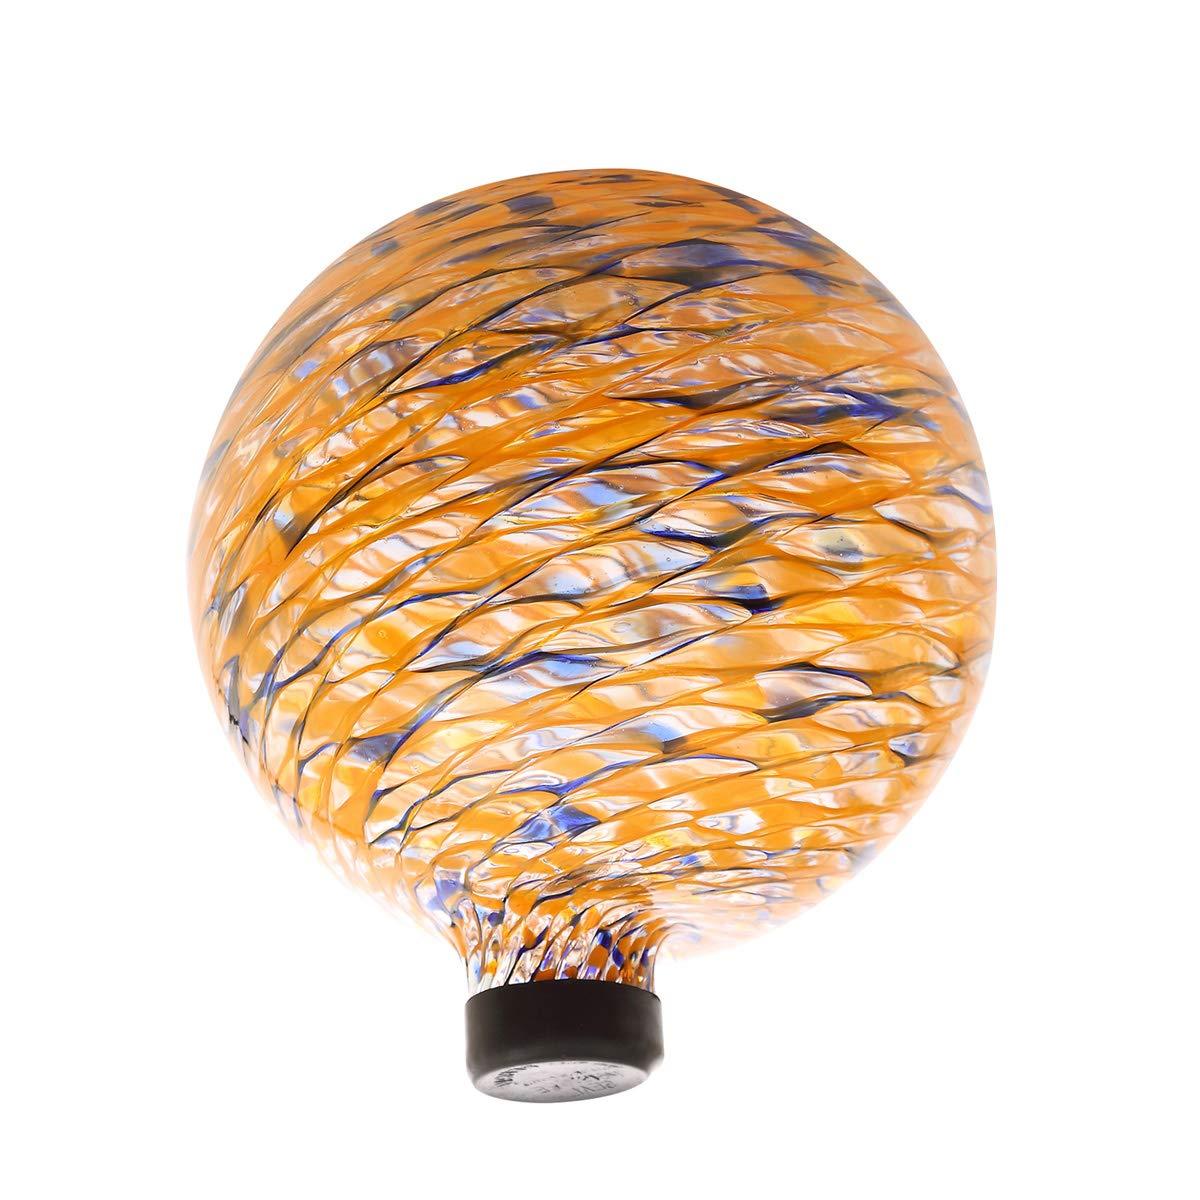 Topadorn Splendor Mosaic Gazing Globe Glass Garden Ball, Outdoor Lawn and Yard Ornament, Gold,10 Inch